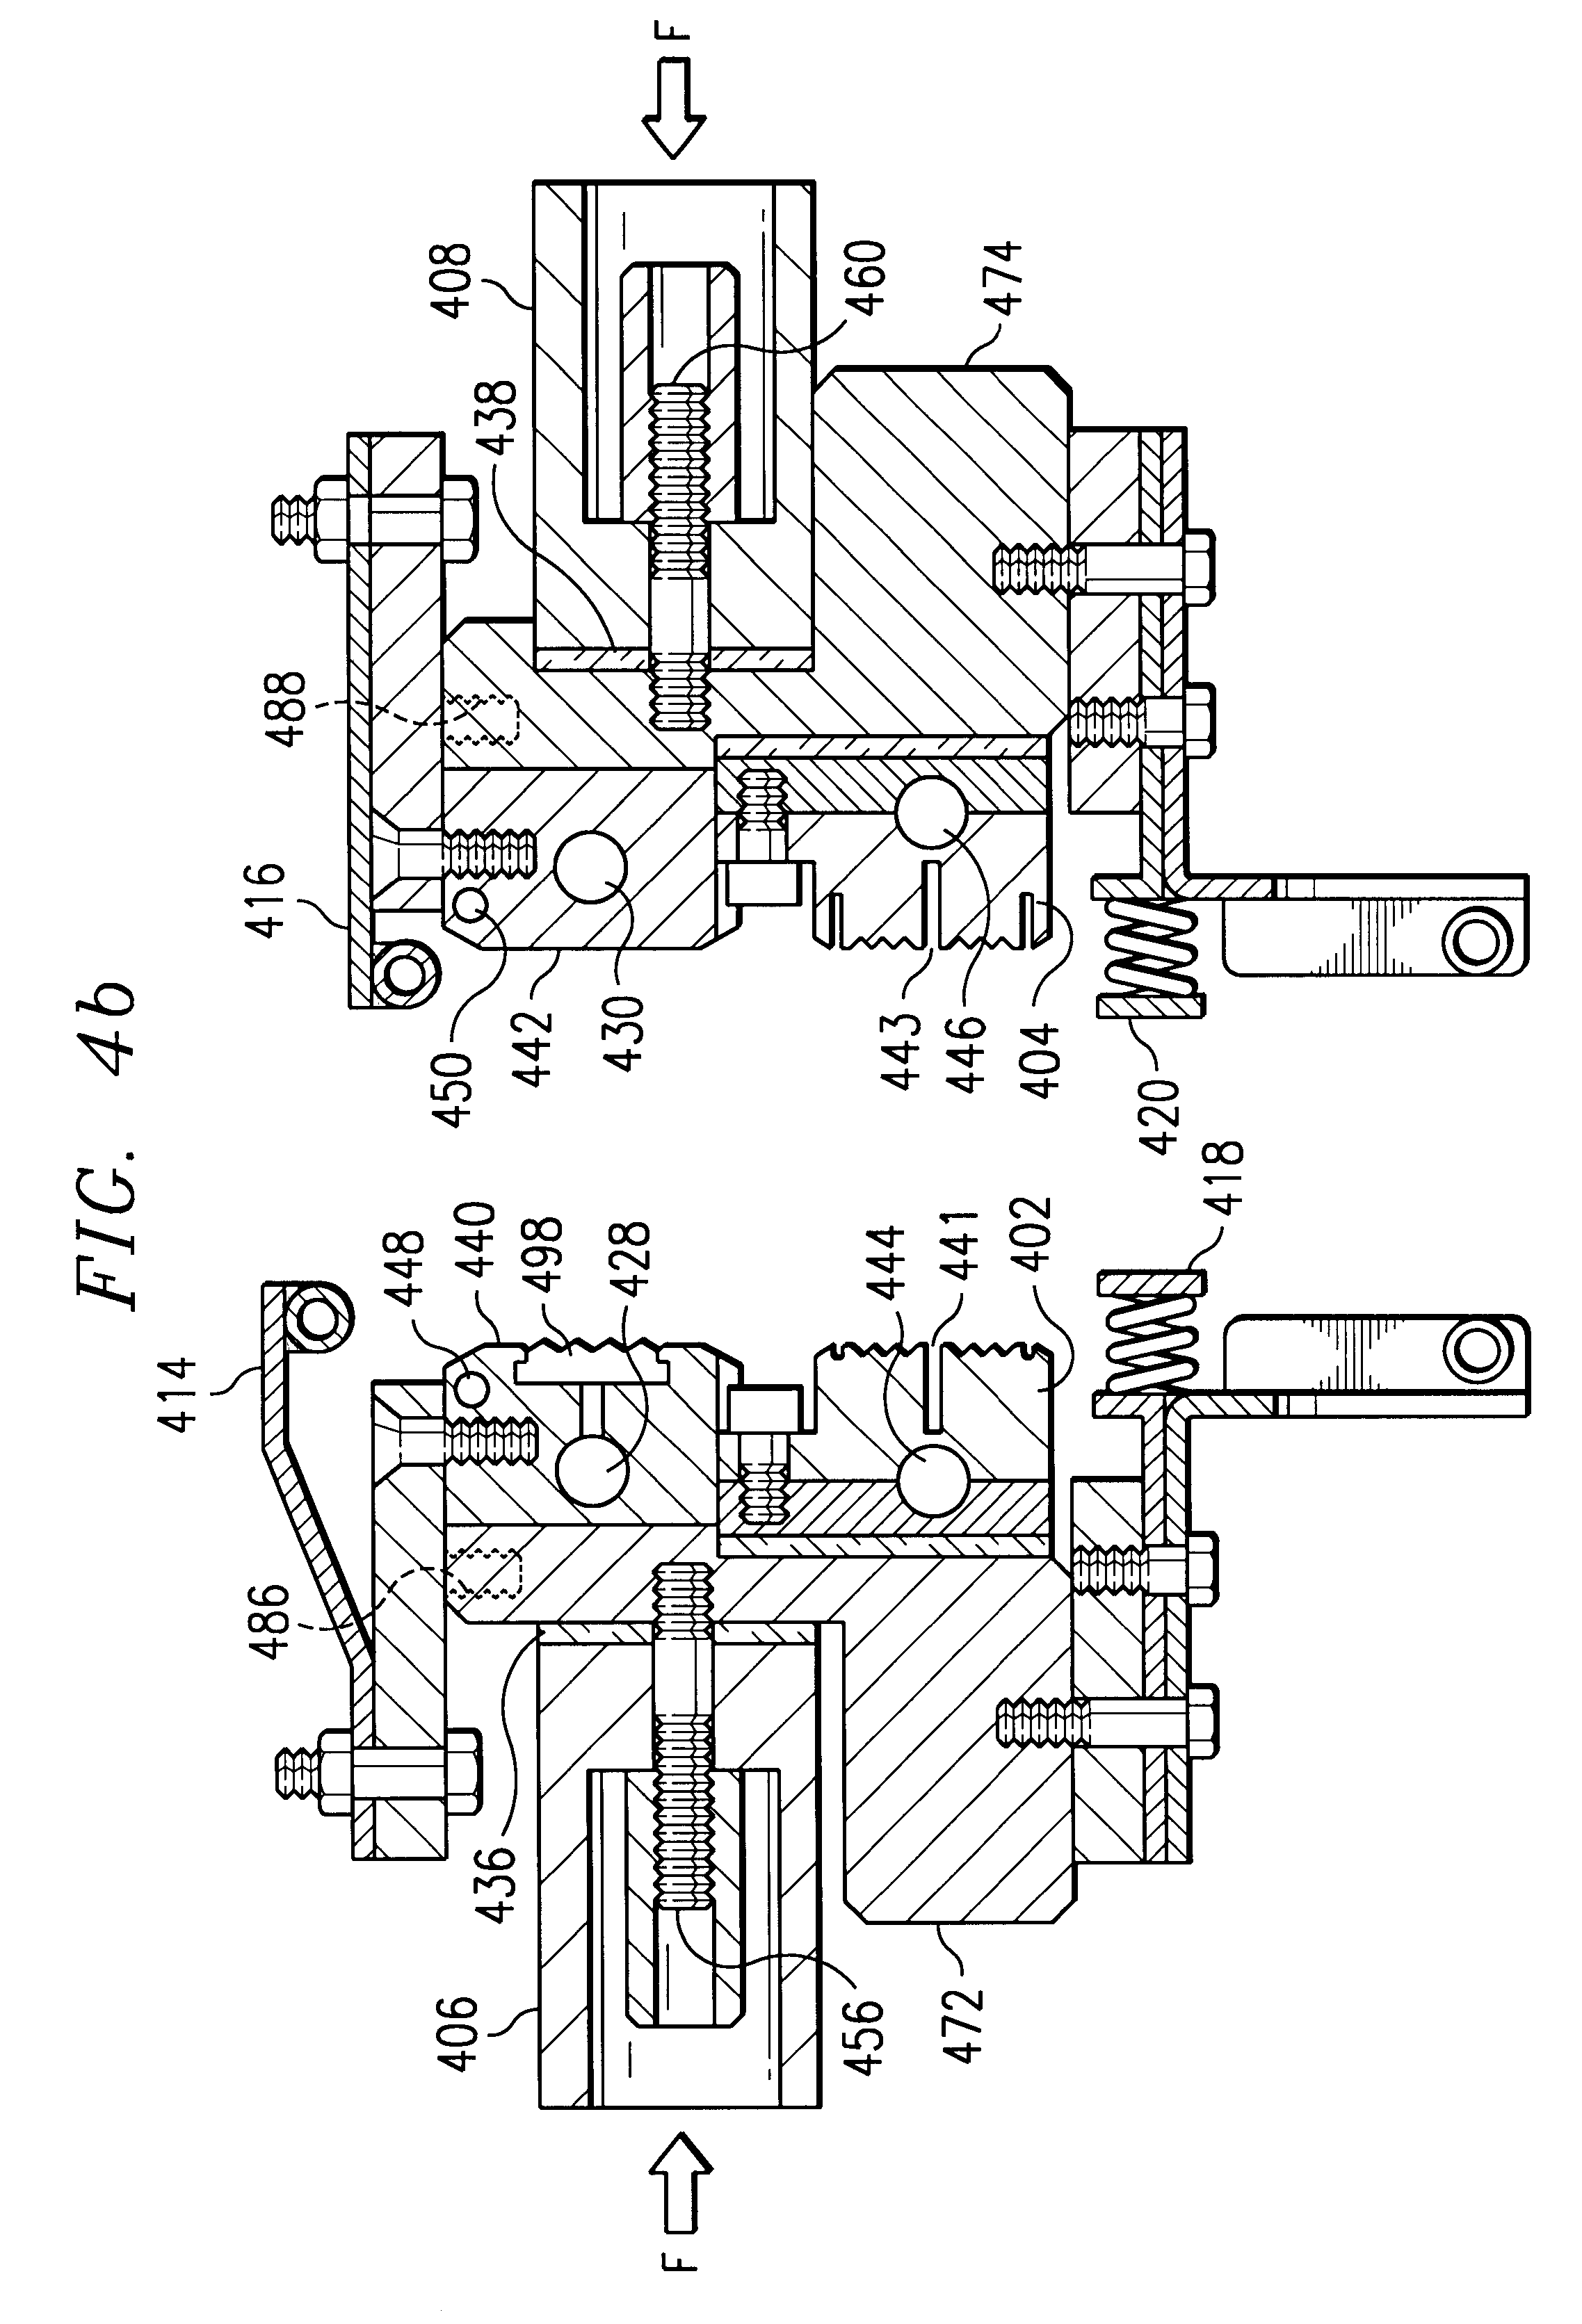 reciprocating sealing jaws wiring harness sealing  u2022 gsmportal co